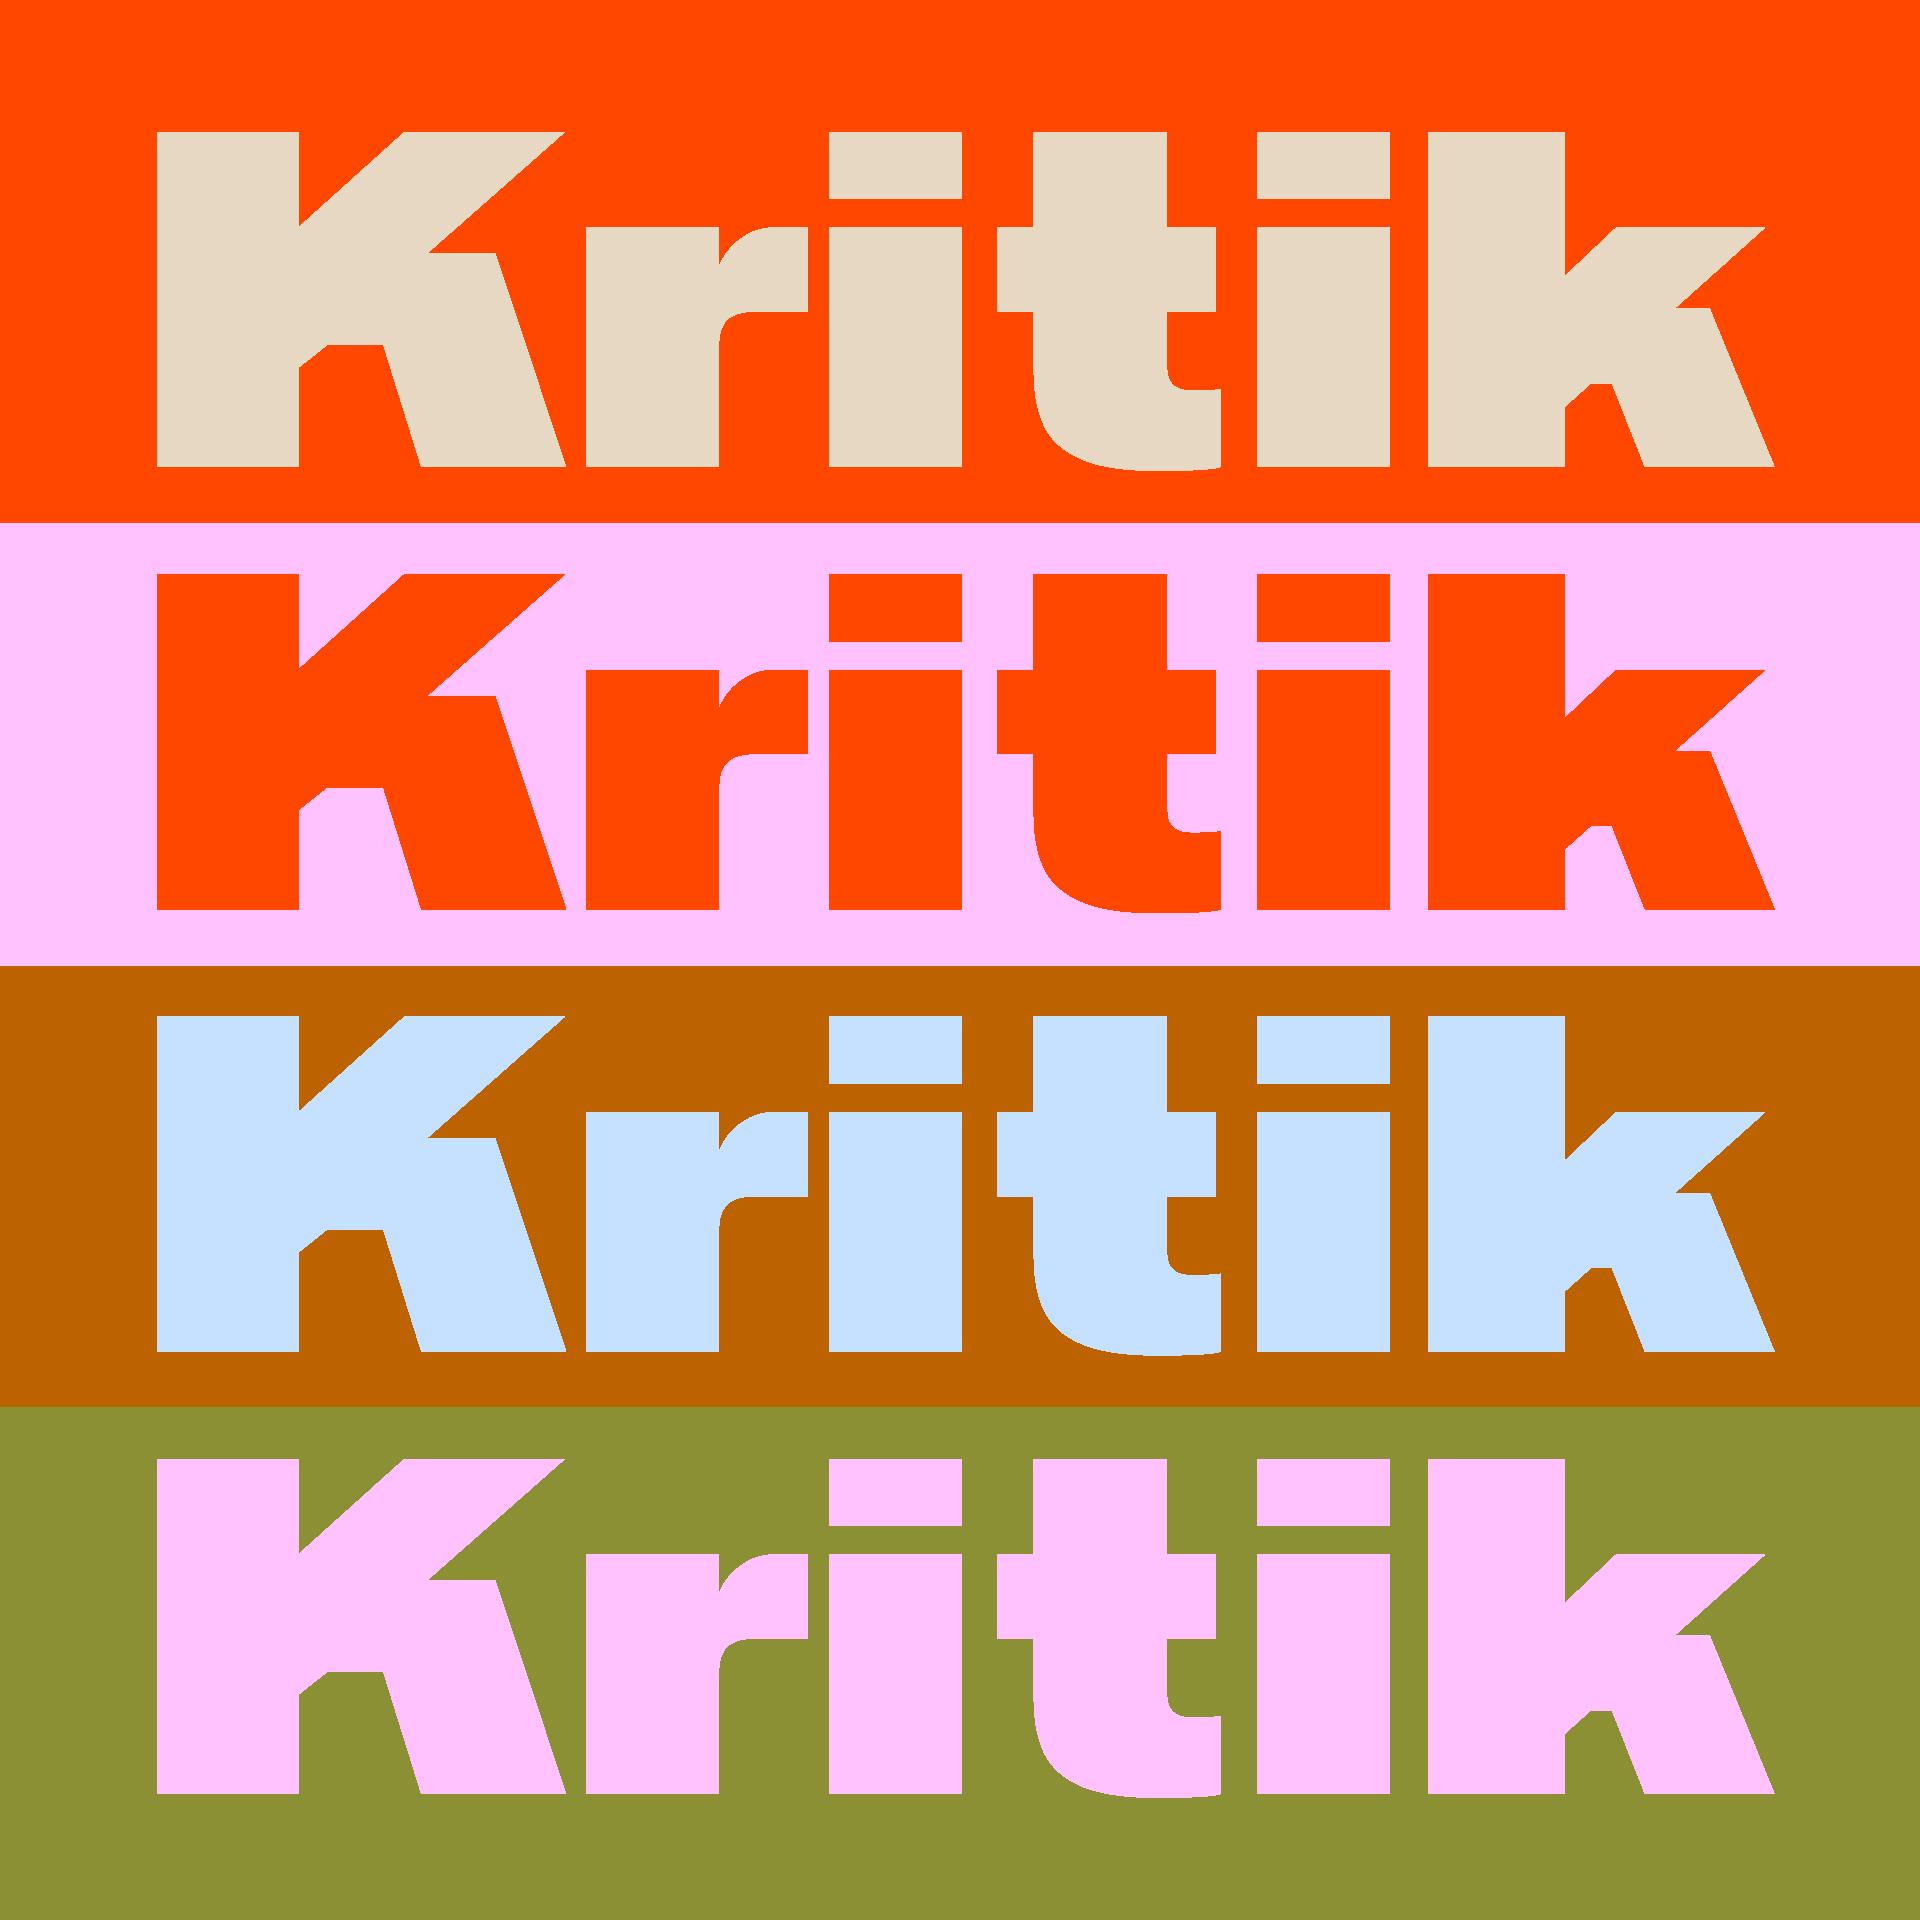 Kritik Typeface Overview